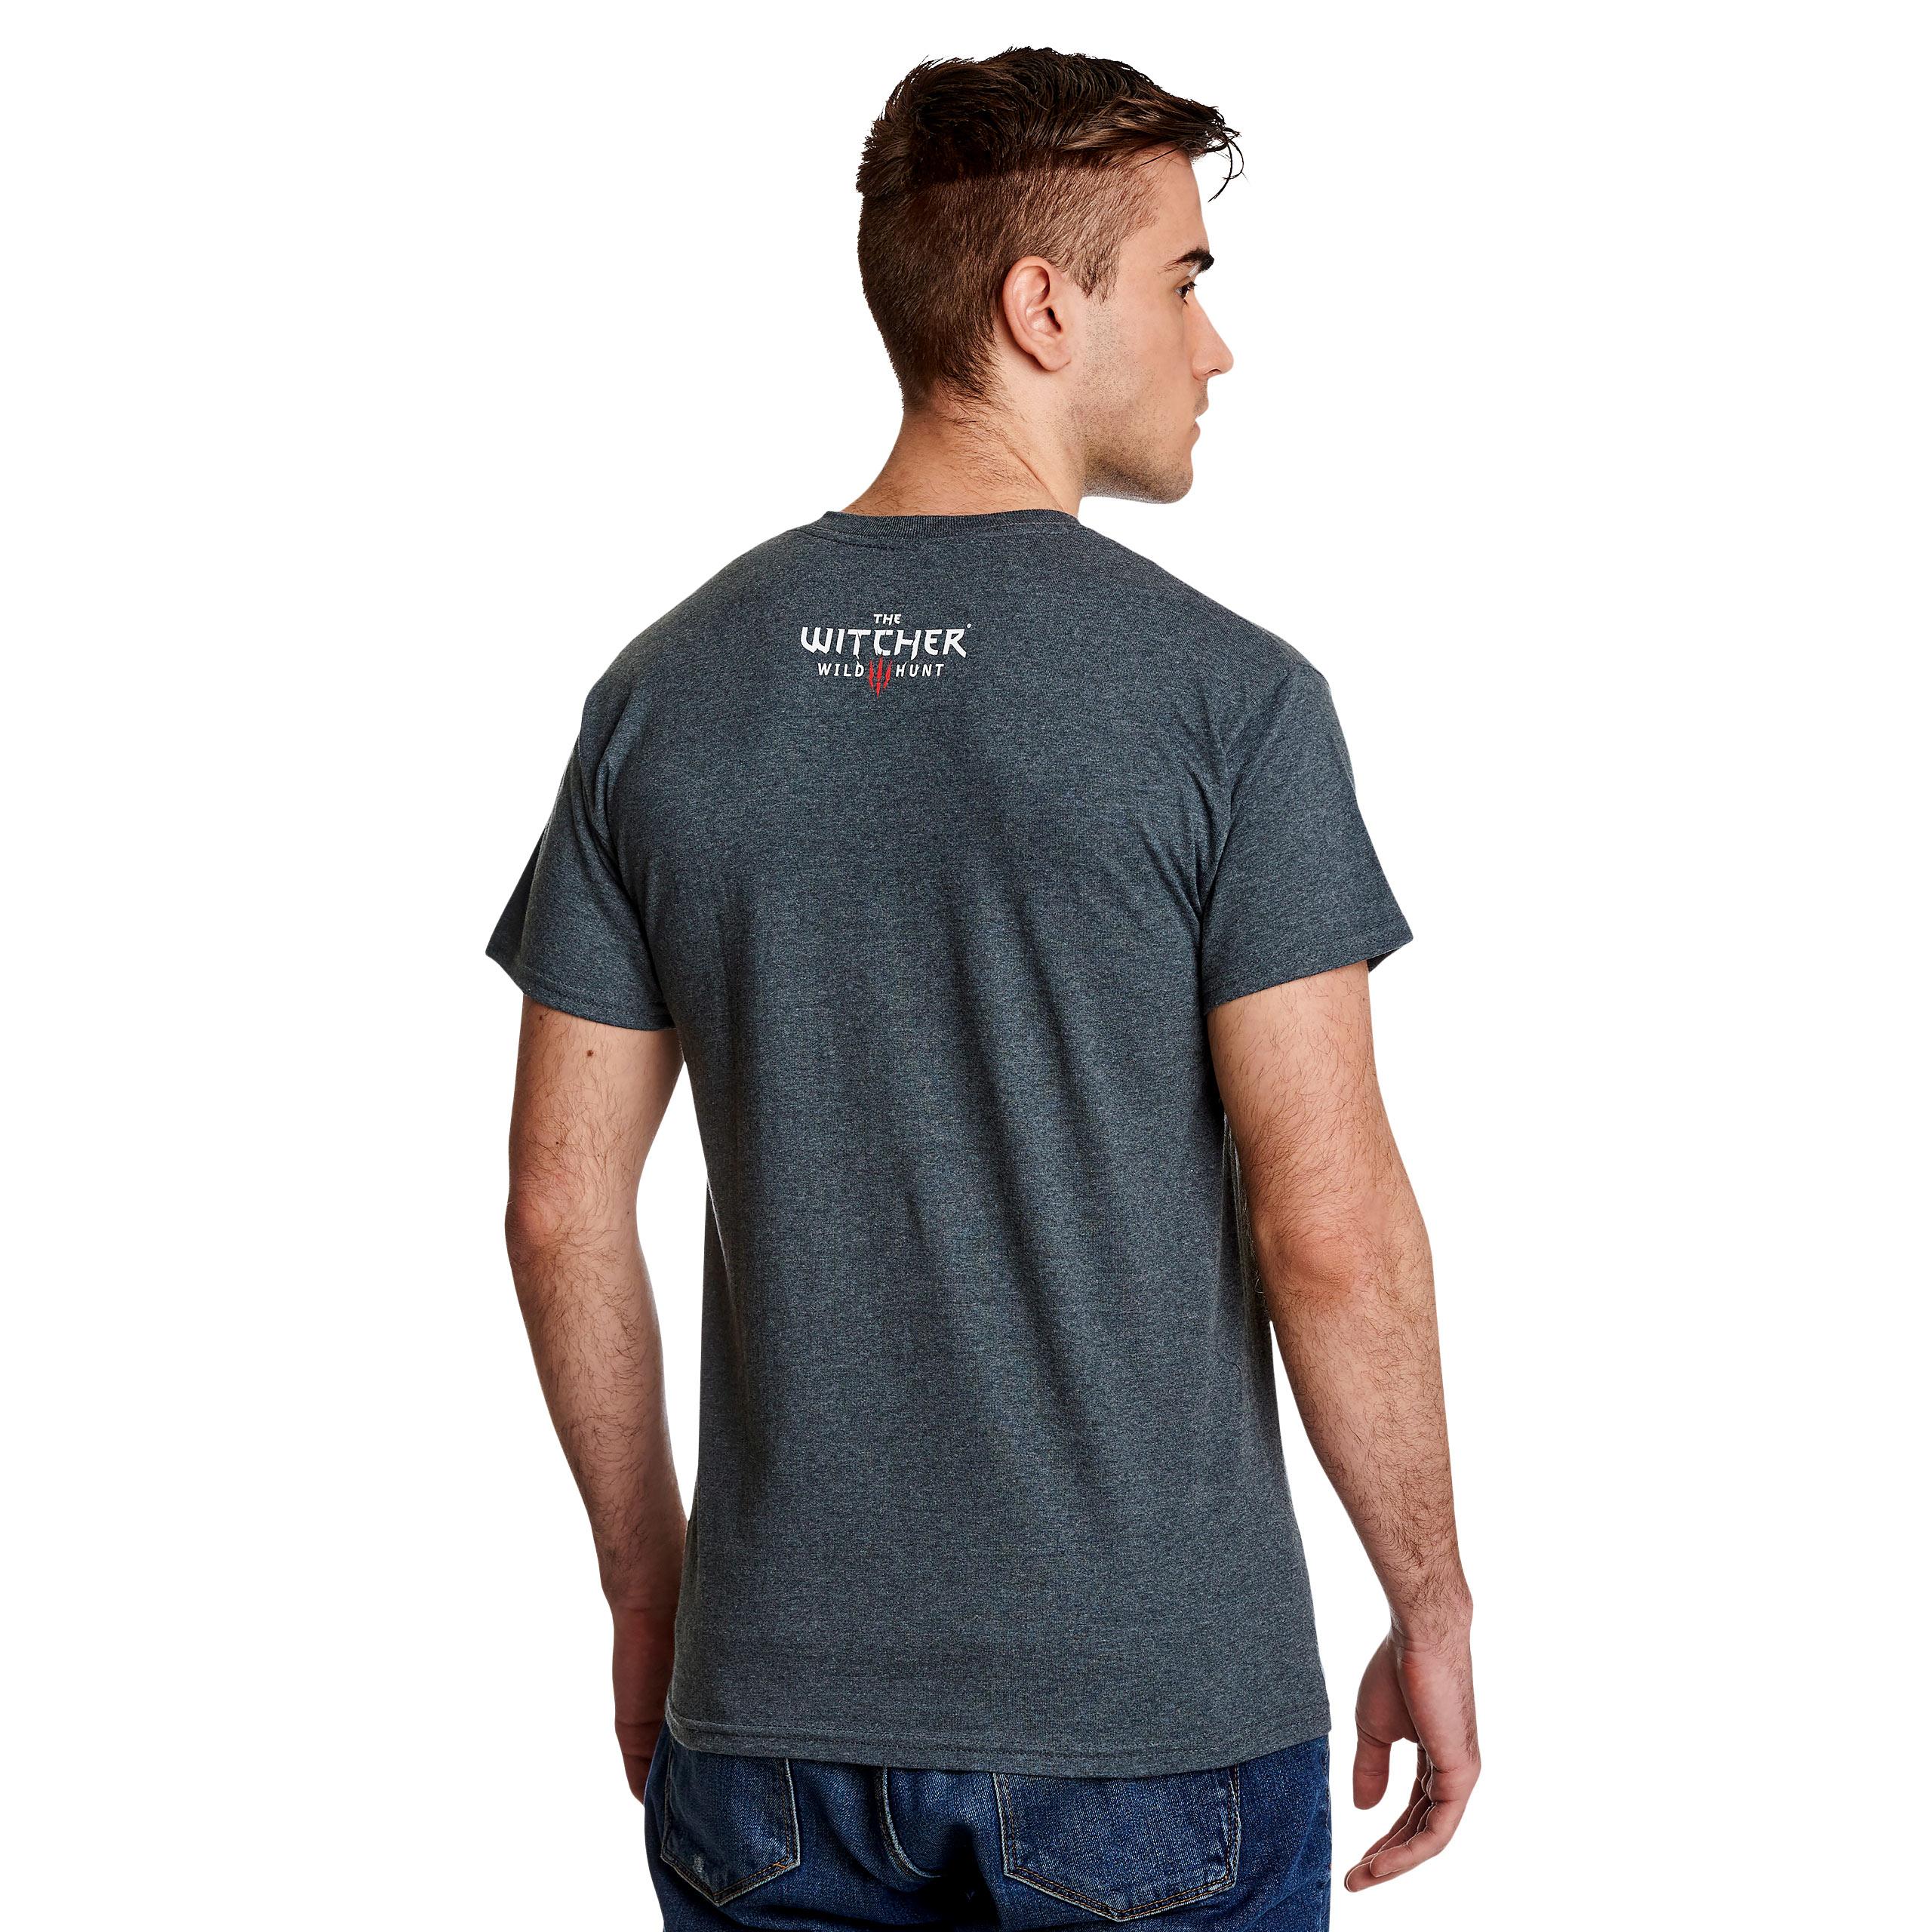 Witcher - Trophy Hunter T-Shirt grau